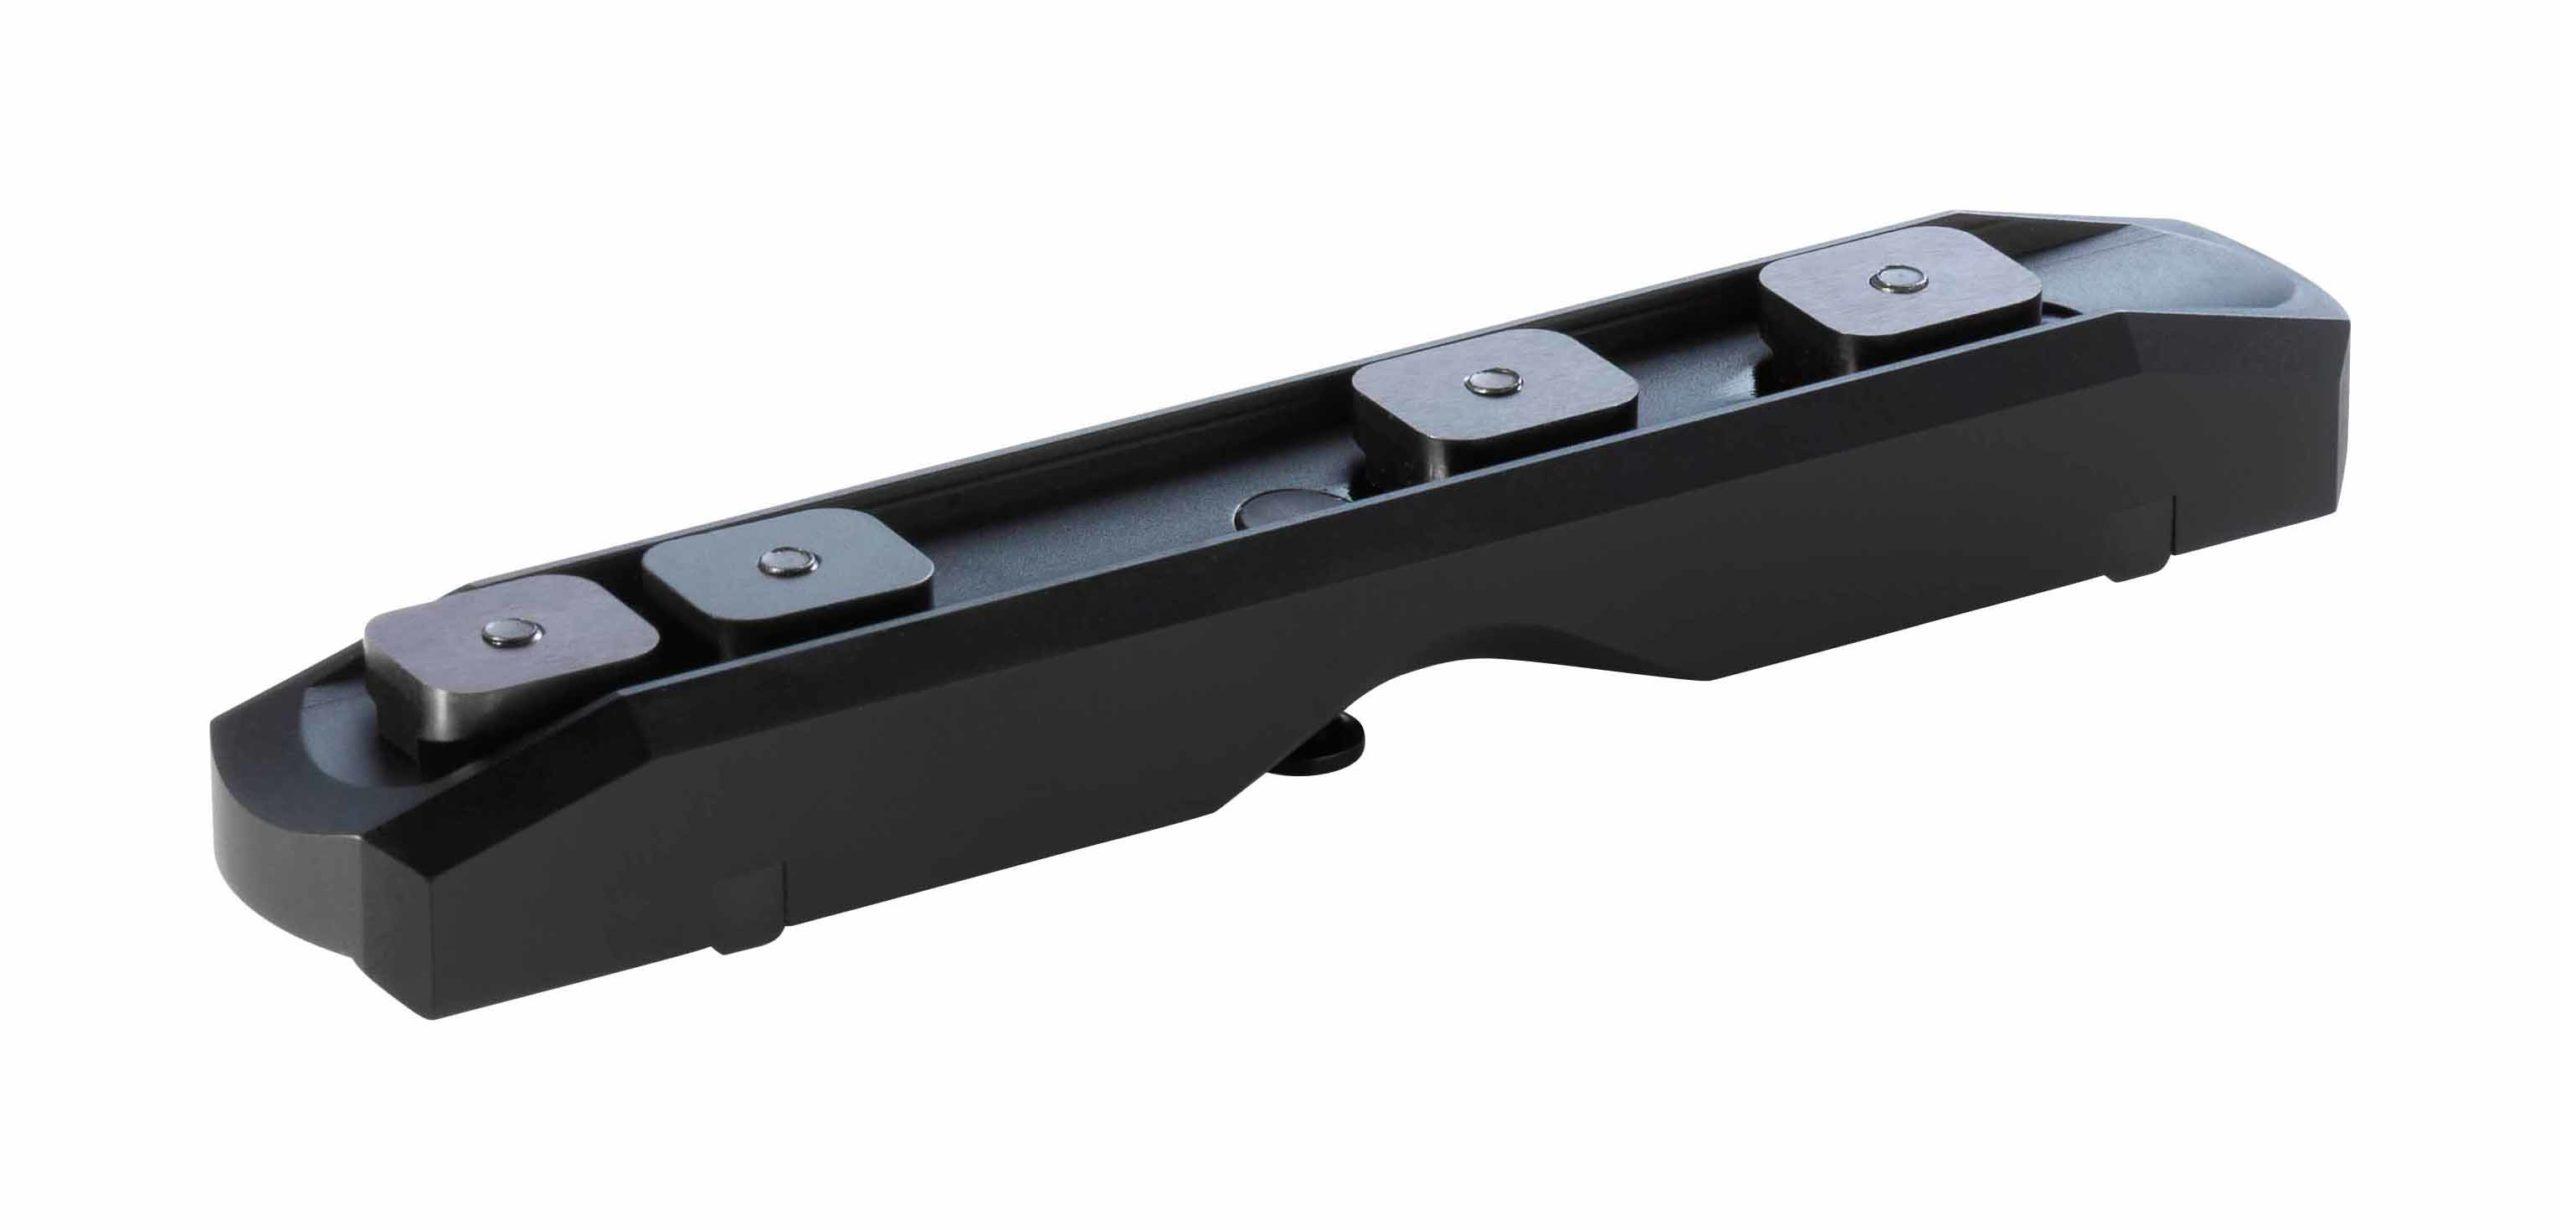 DENTLER Montageschiene BASIS® SCHMIDT & BENDER - Montageschiene für Zieloptik